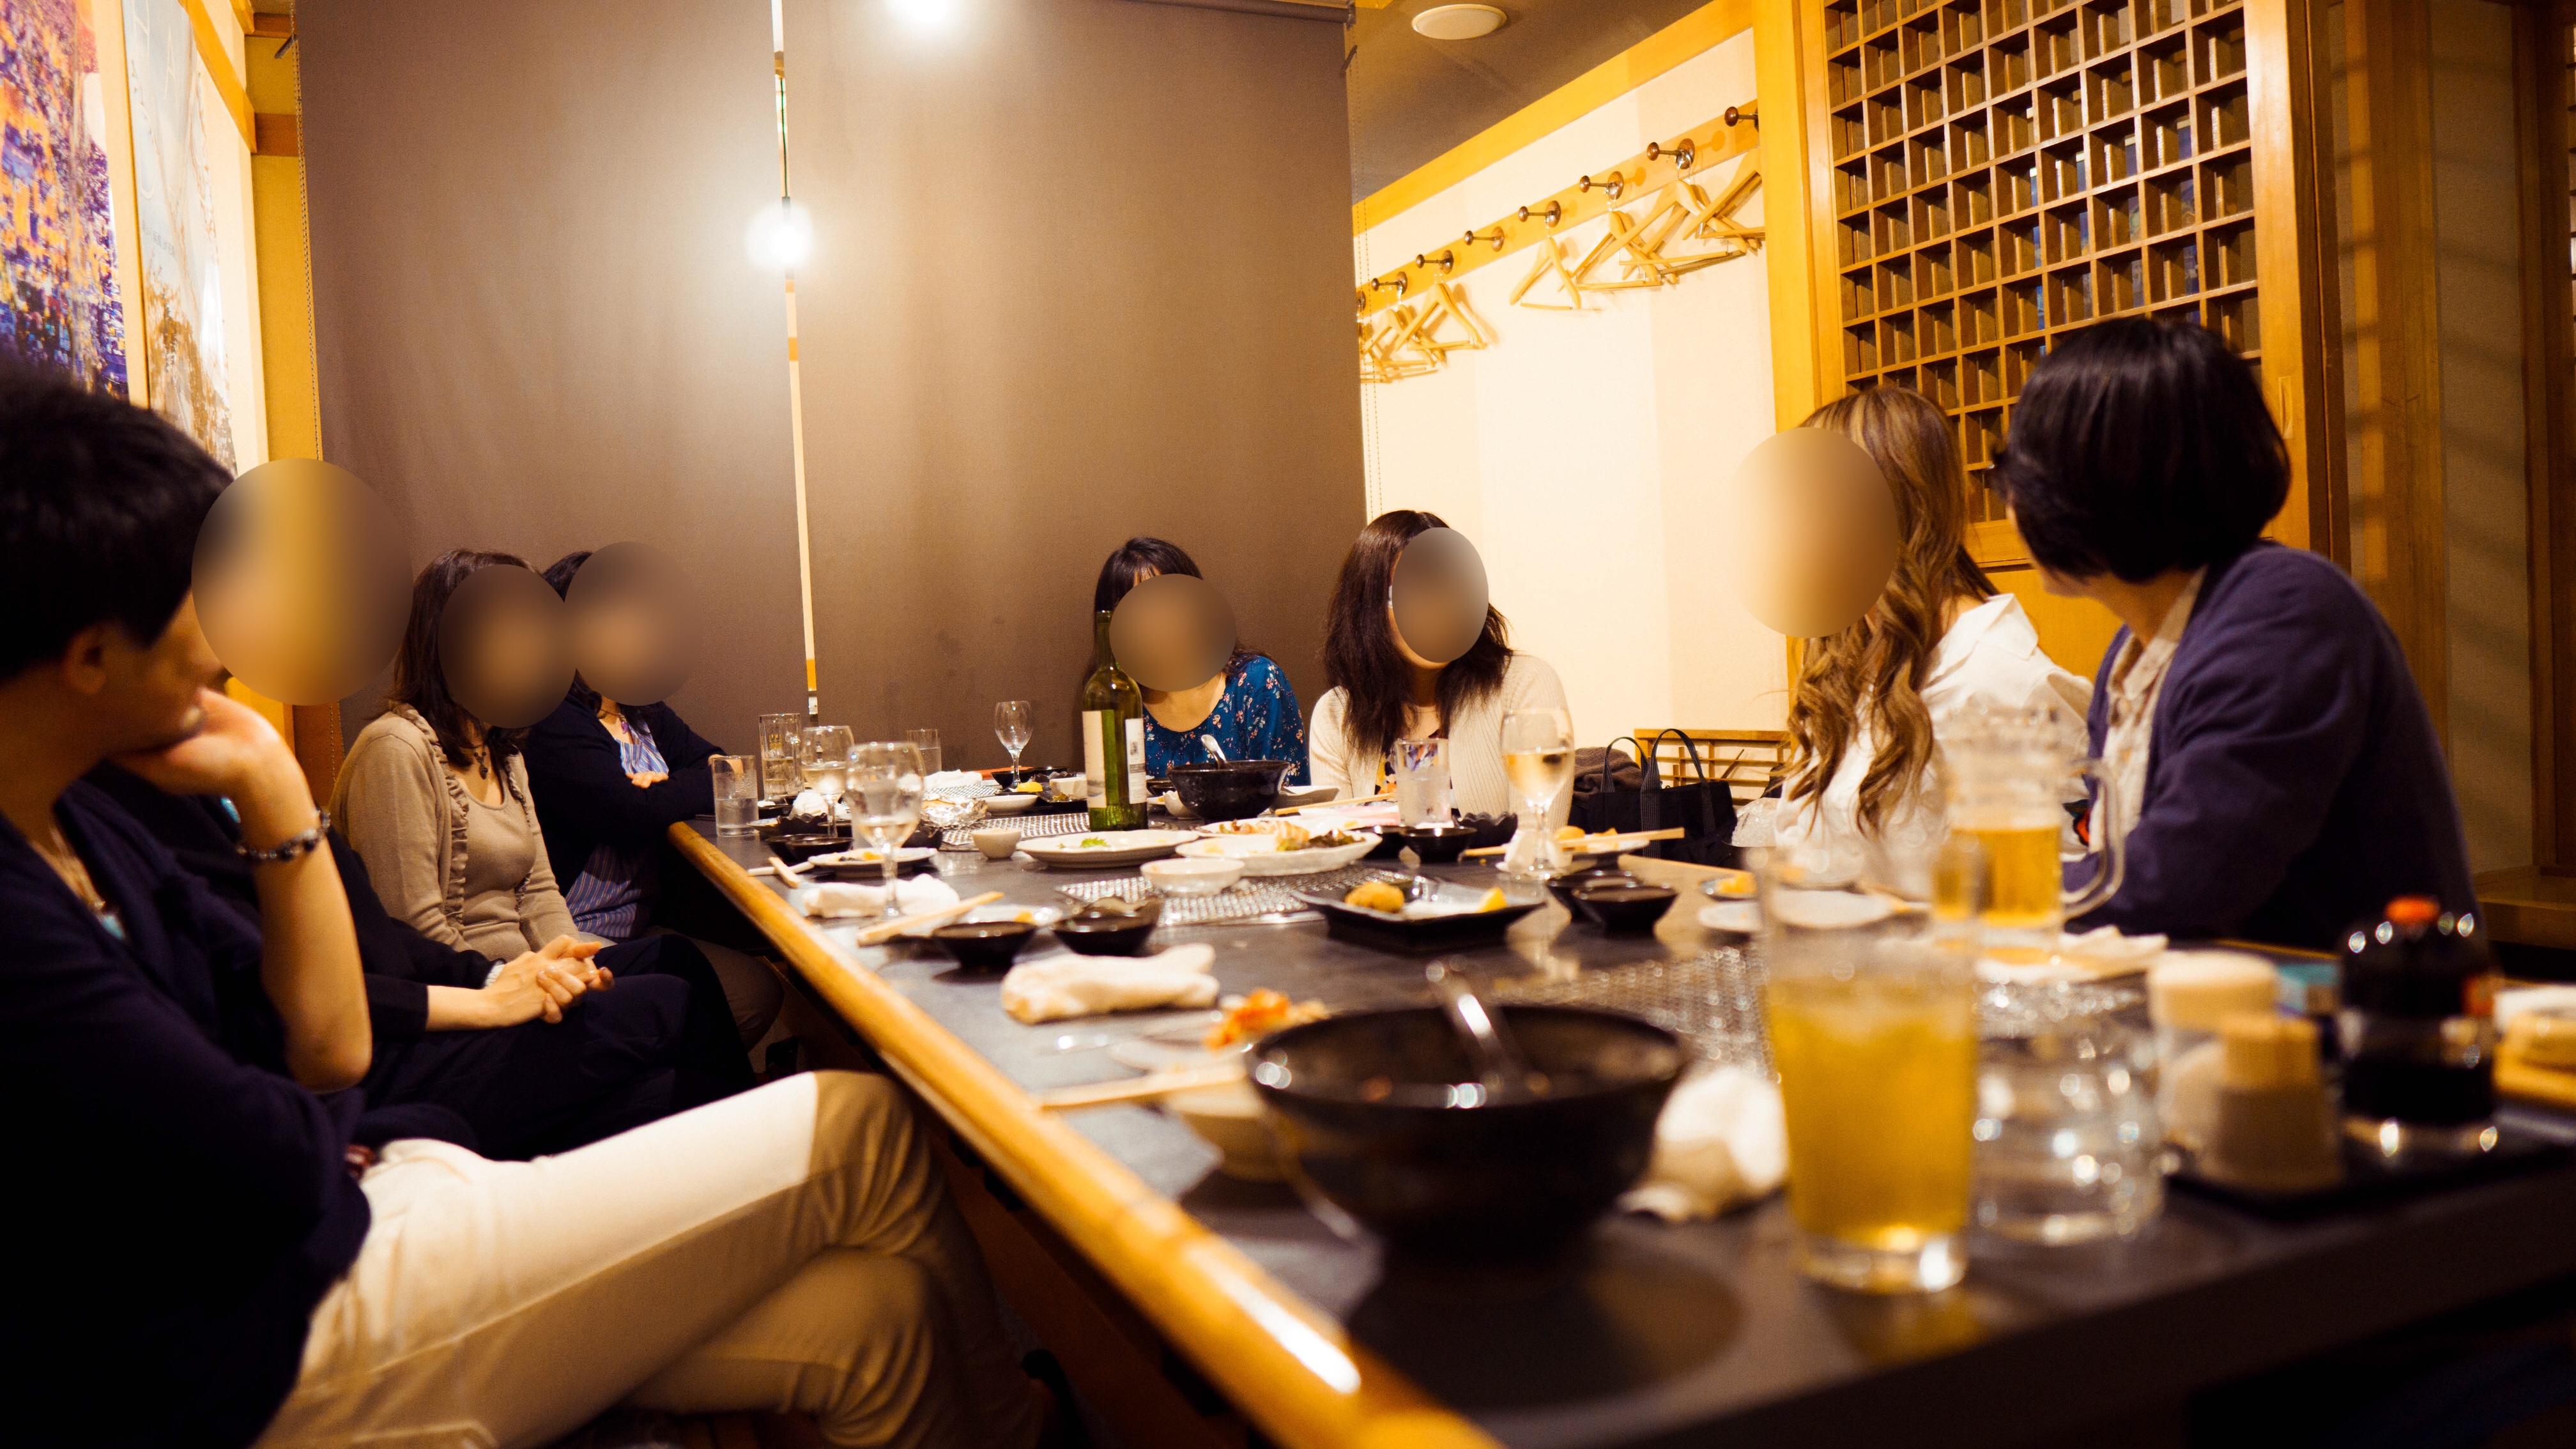 img 7701 - ナインハピネスプロ@in札幌合宿